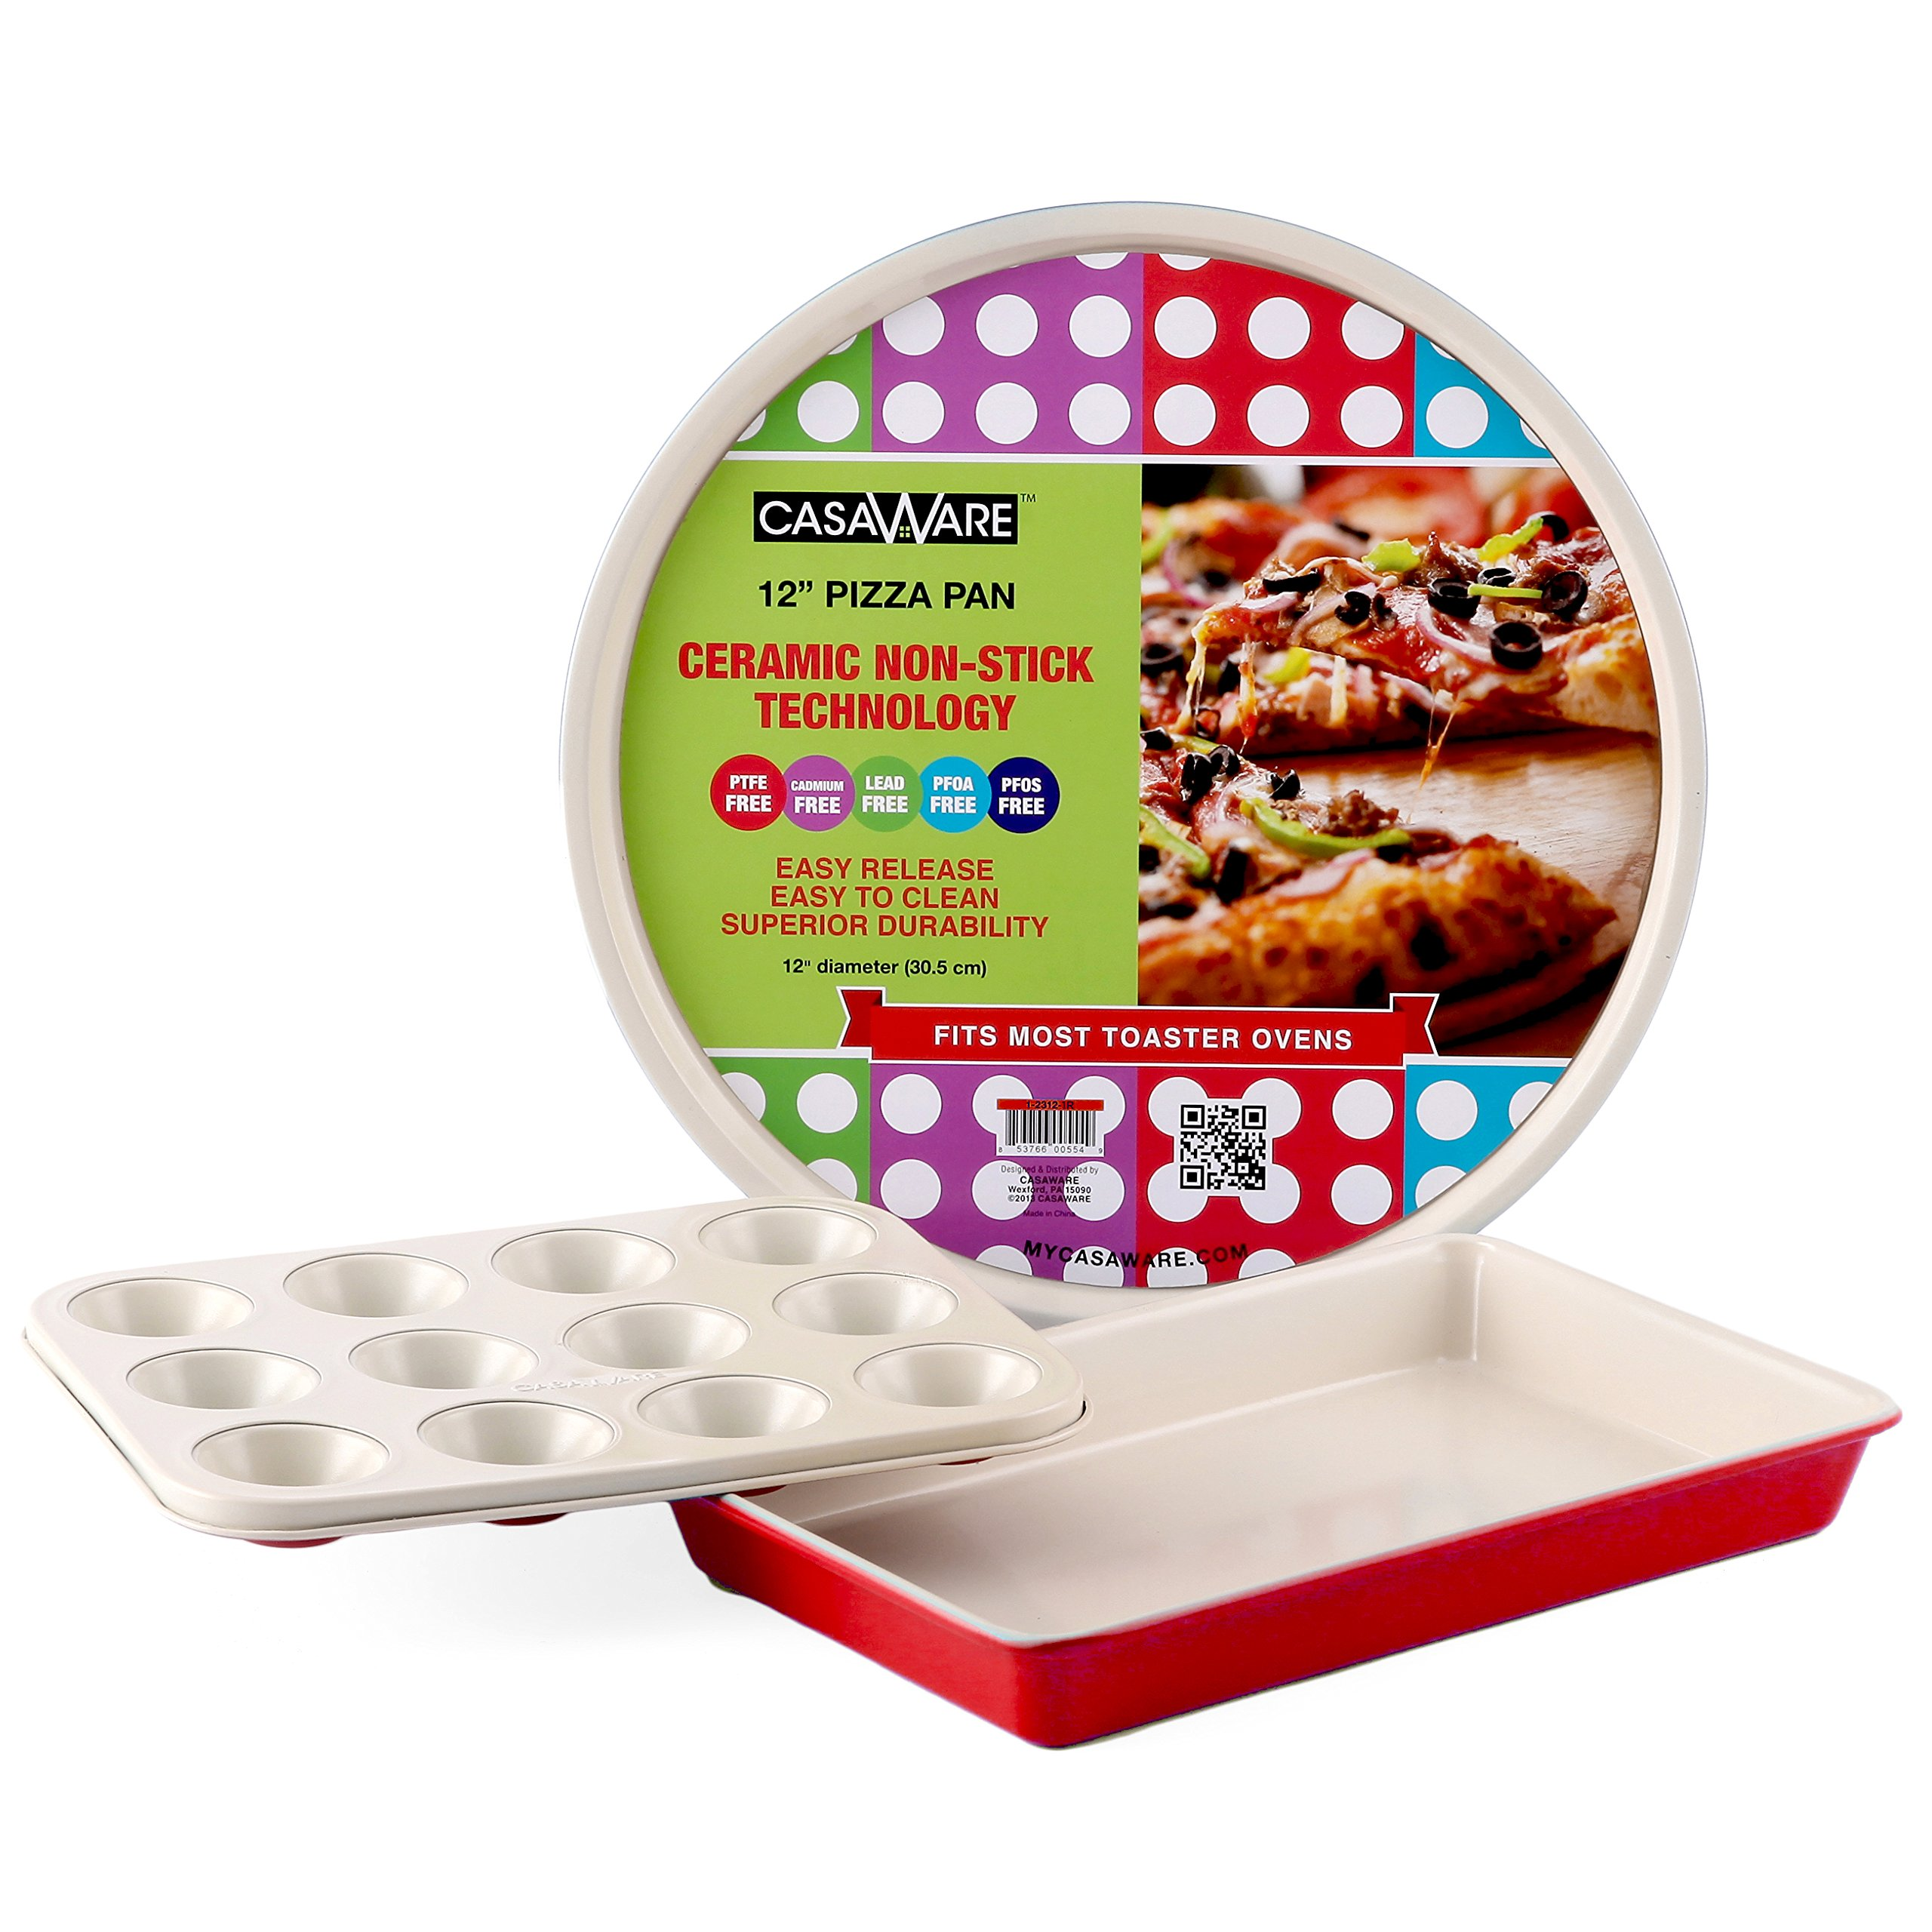 casaWare Toaster Oven 3pc Set Ceramic Coated Non-Stick (Cream/Red) by casaWare